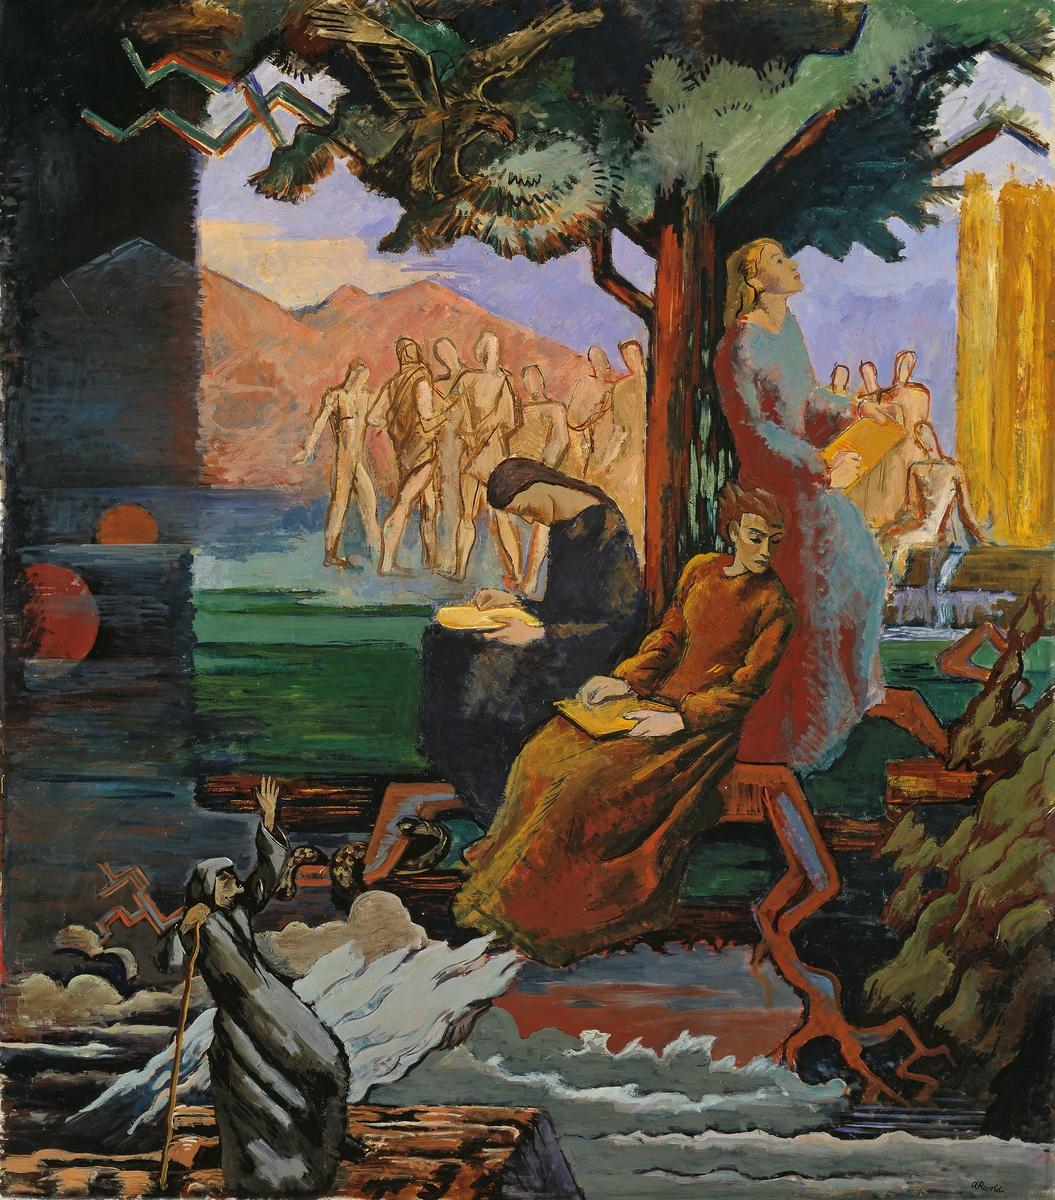 Yggdrasil. Utkast til freske i Universitetsbiblioteket i Oslo [Maleri]